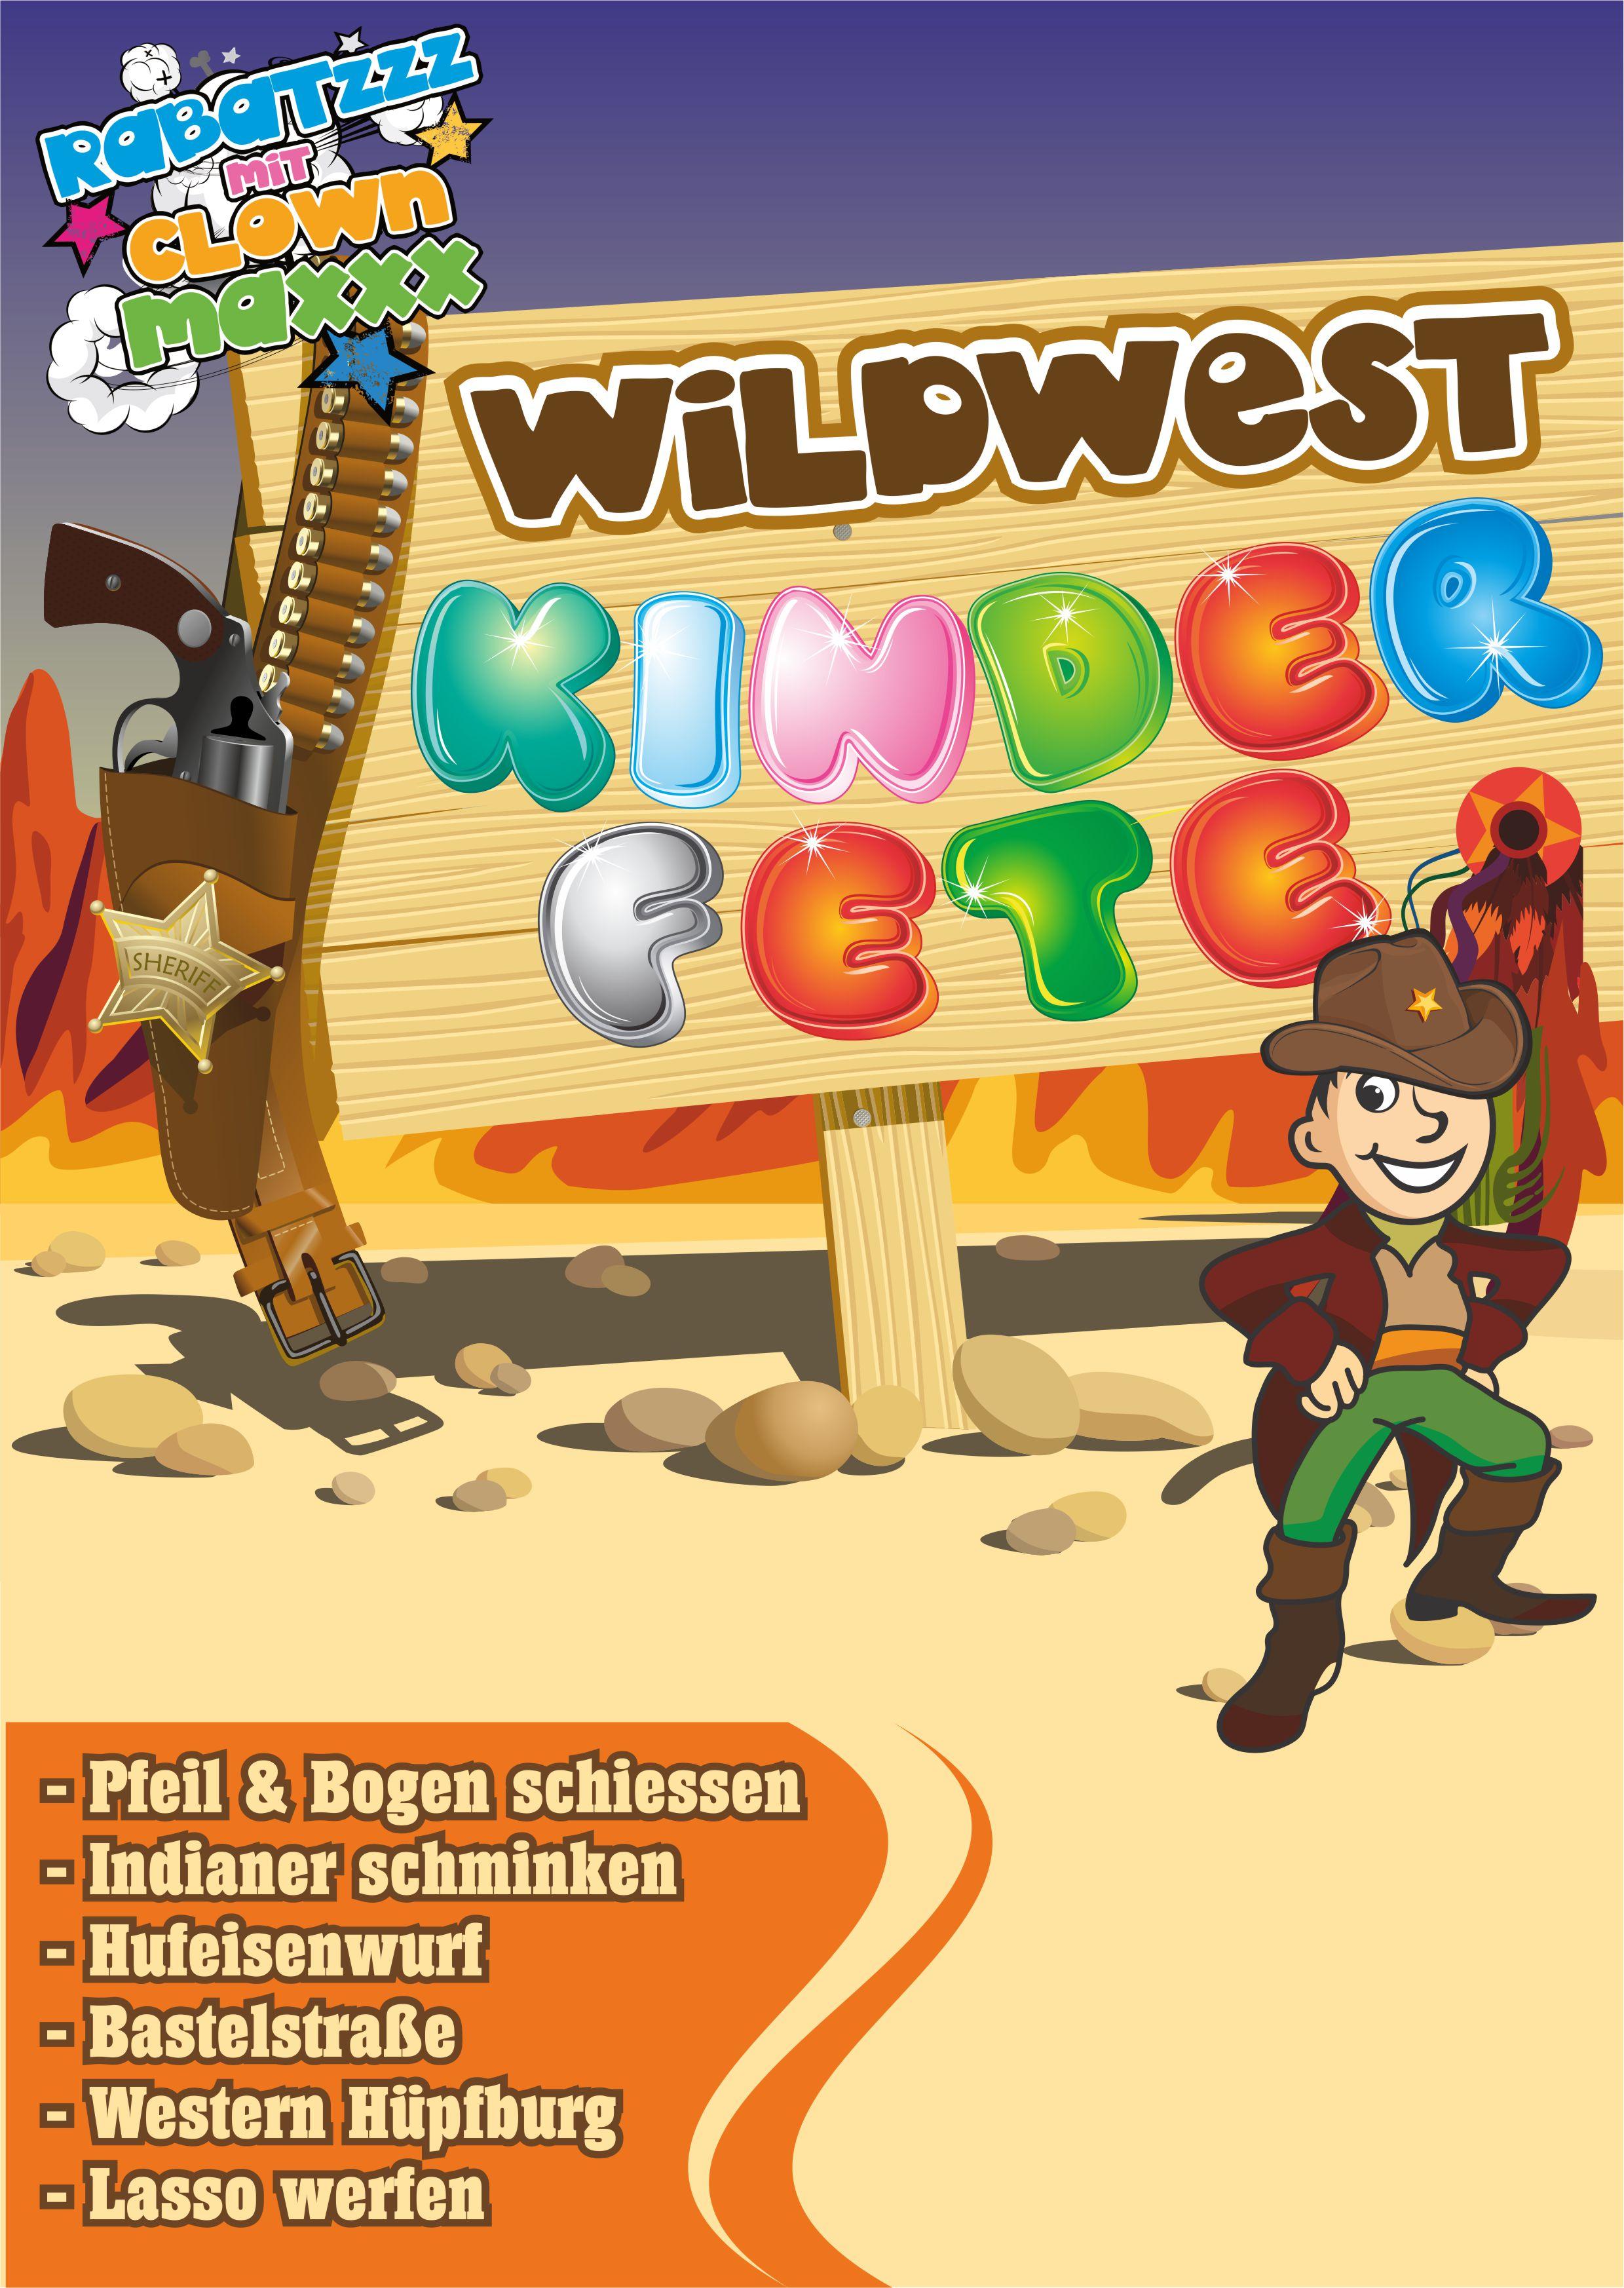 plakat-kinderfest-western-indianer